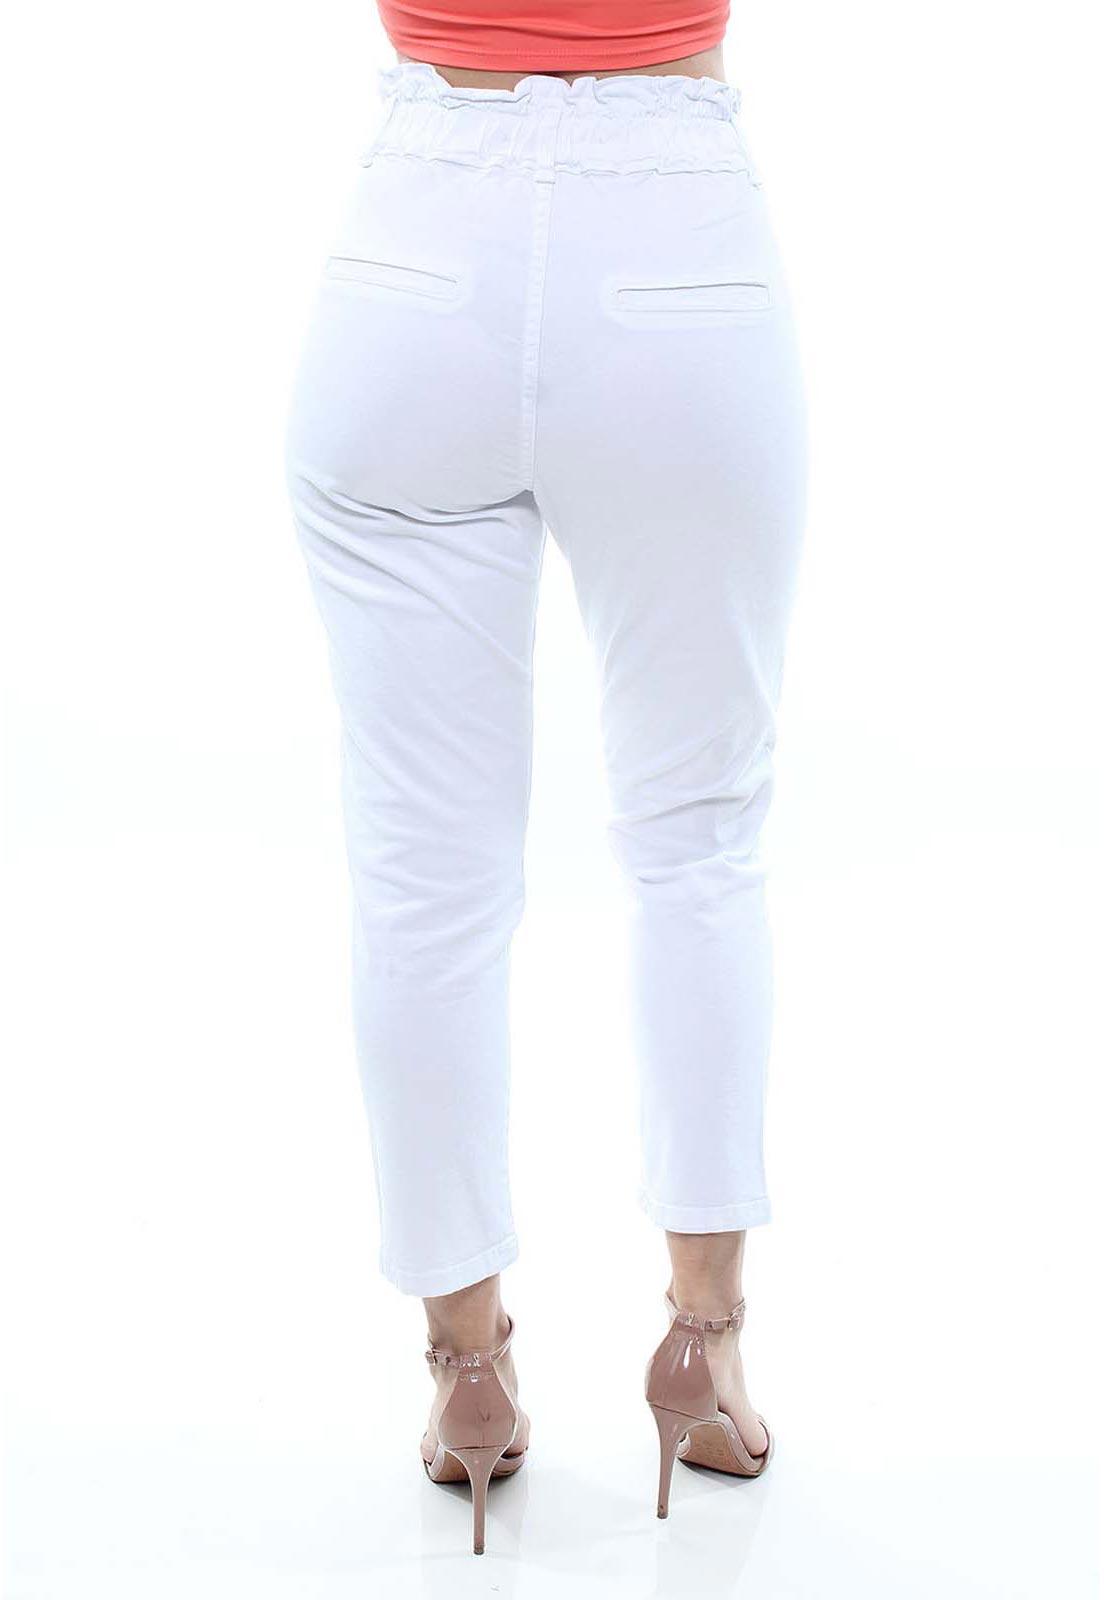 Calça Jeans Feminina Sarja Clochard Branca Crocker - 47717  - CROCKER JEANS